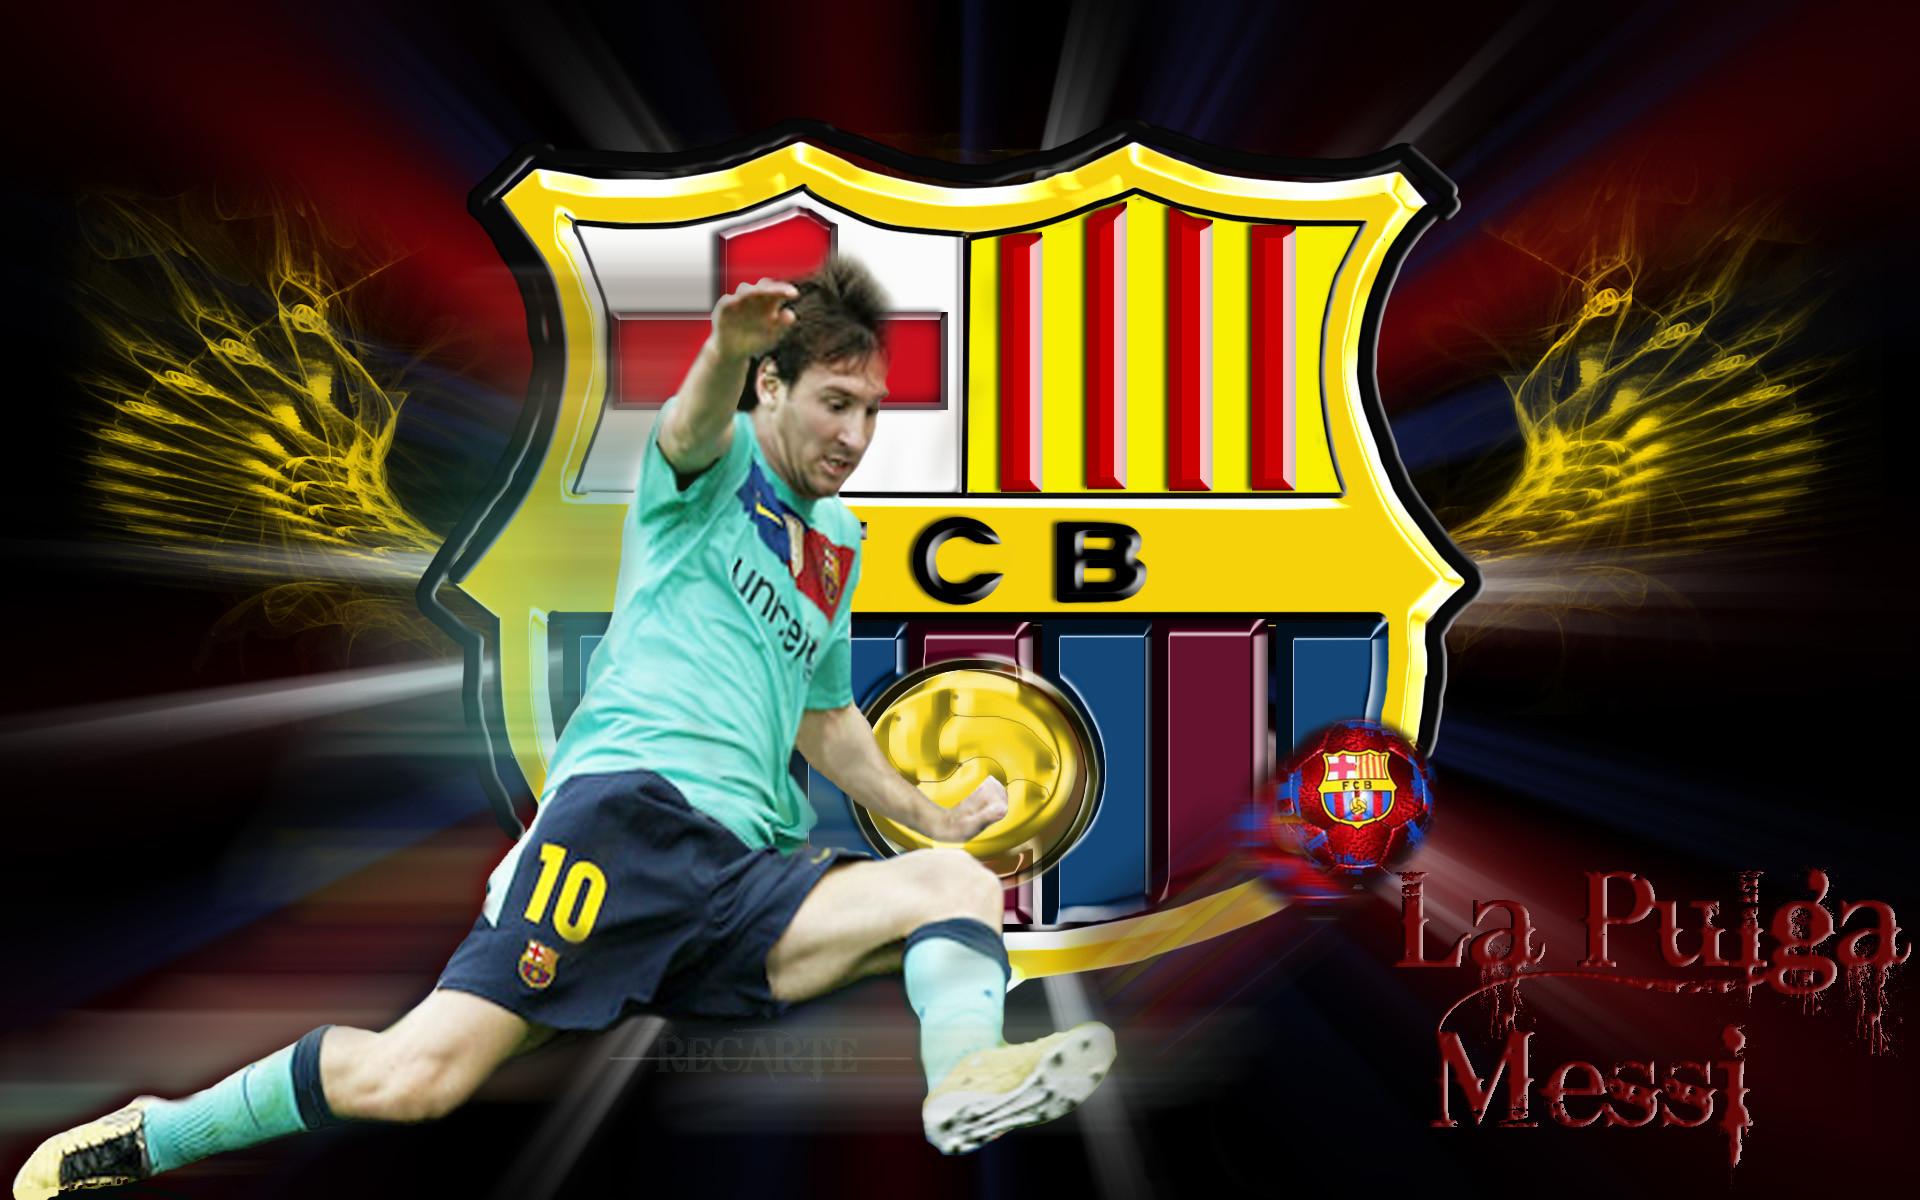 Lionel Messi Wallpaper Desktop